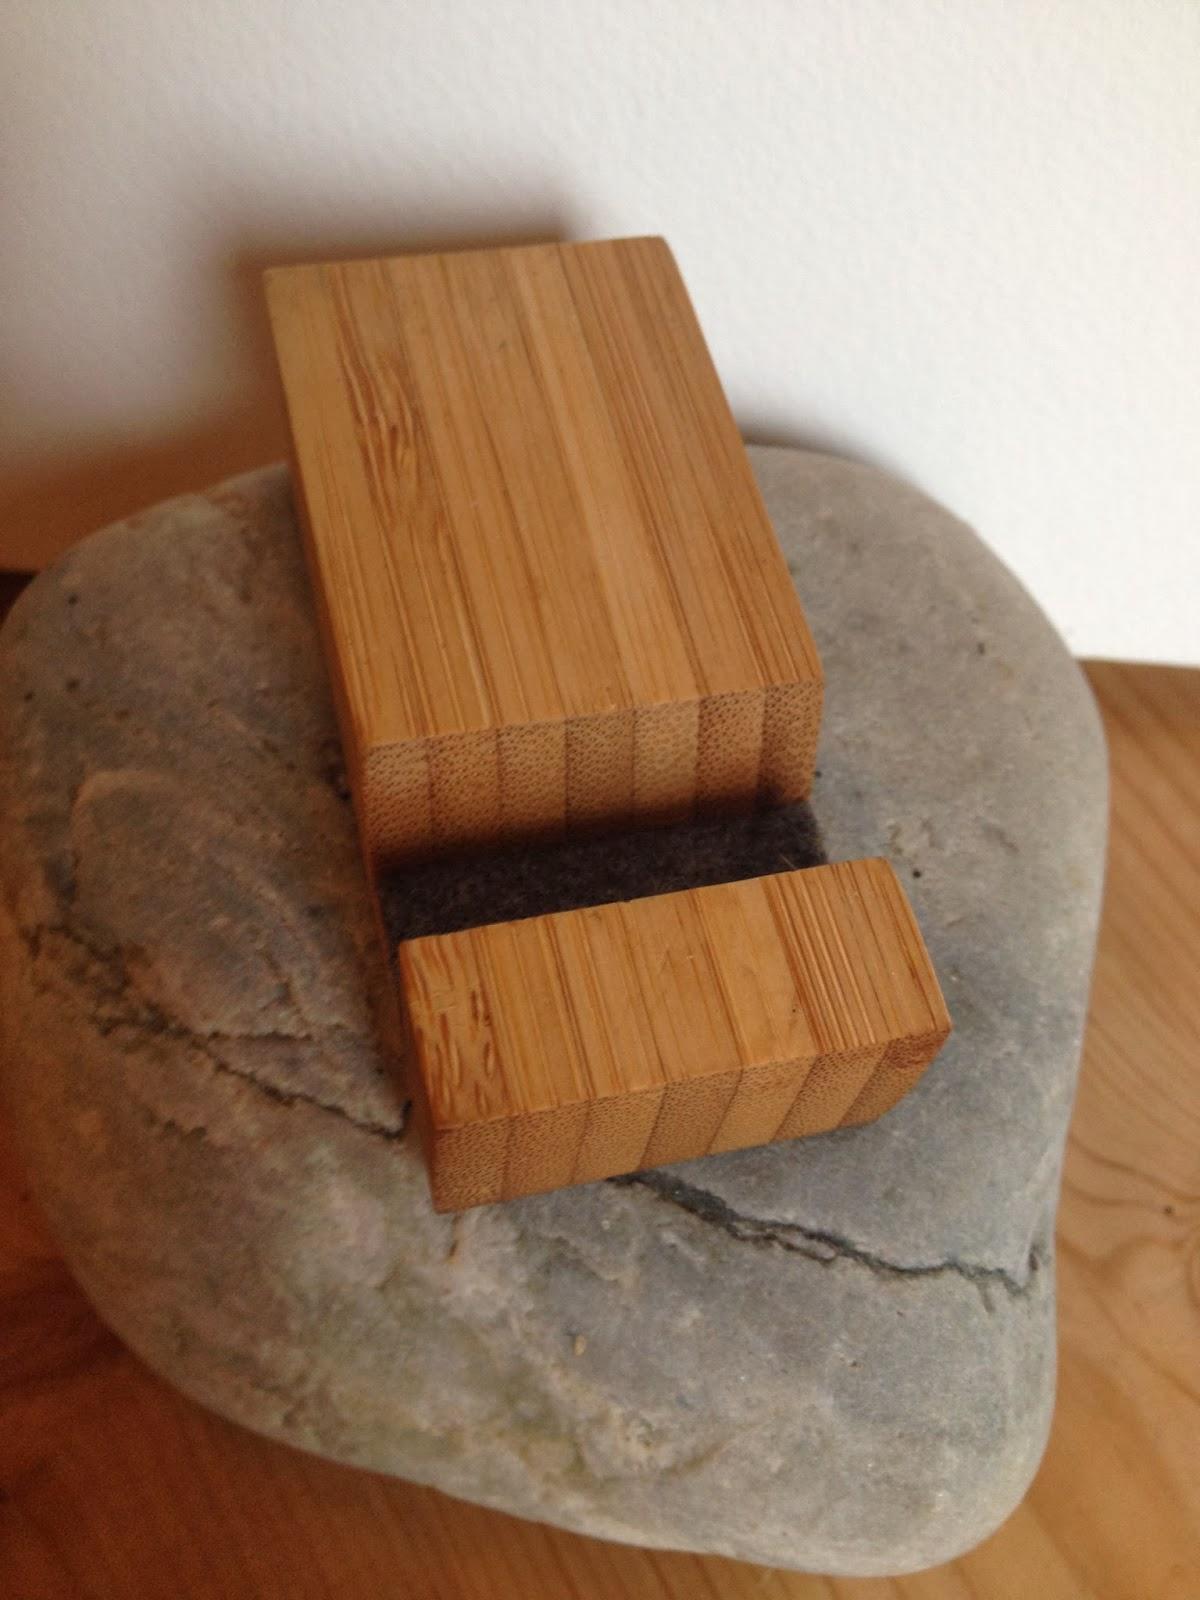 Bamboo iPhone holder